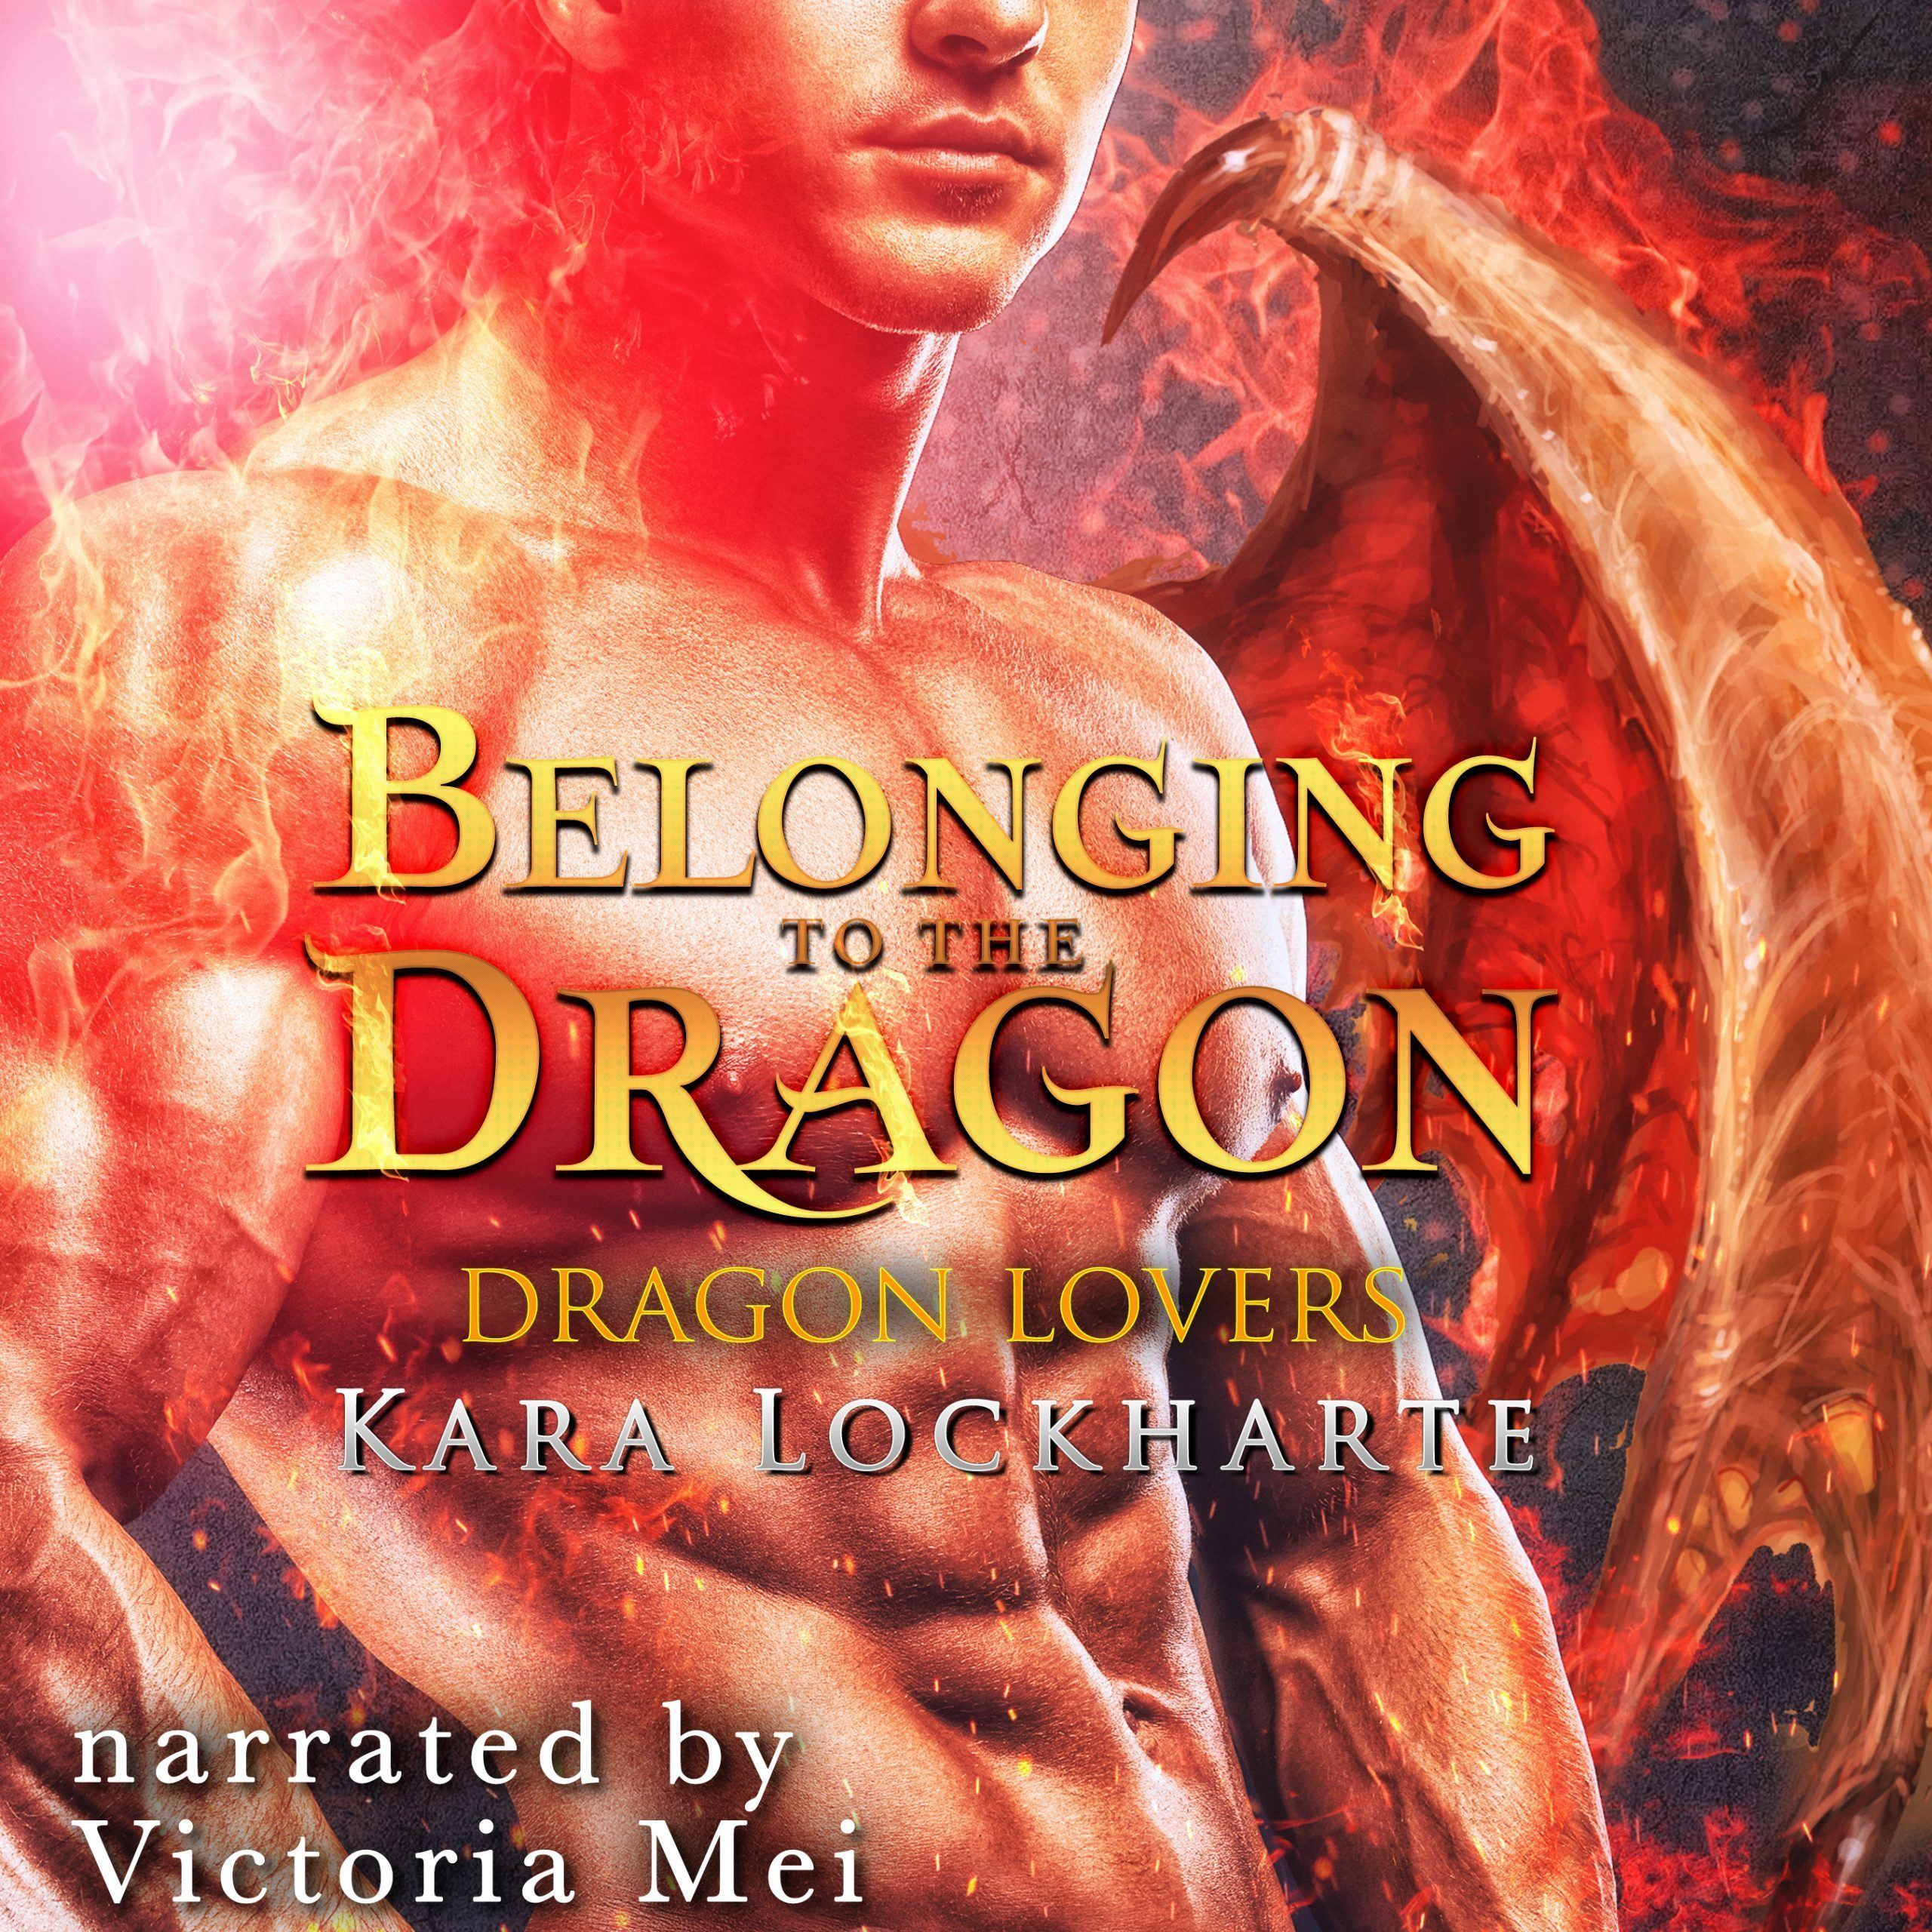 Belonging to the Dragon by Kara Lockharte Audiobook